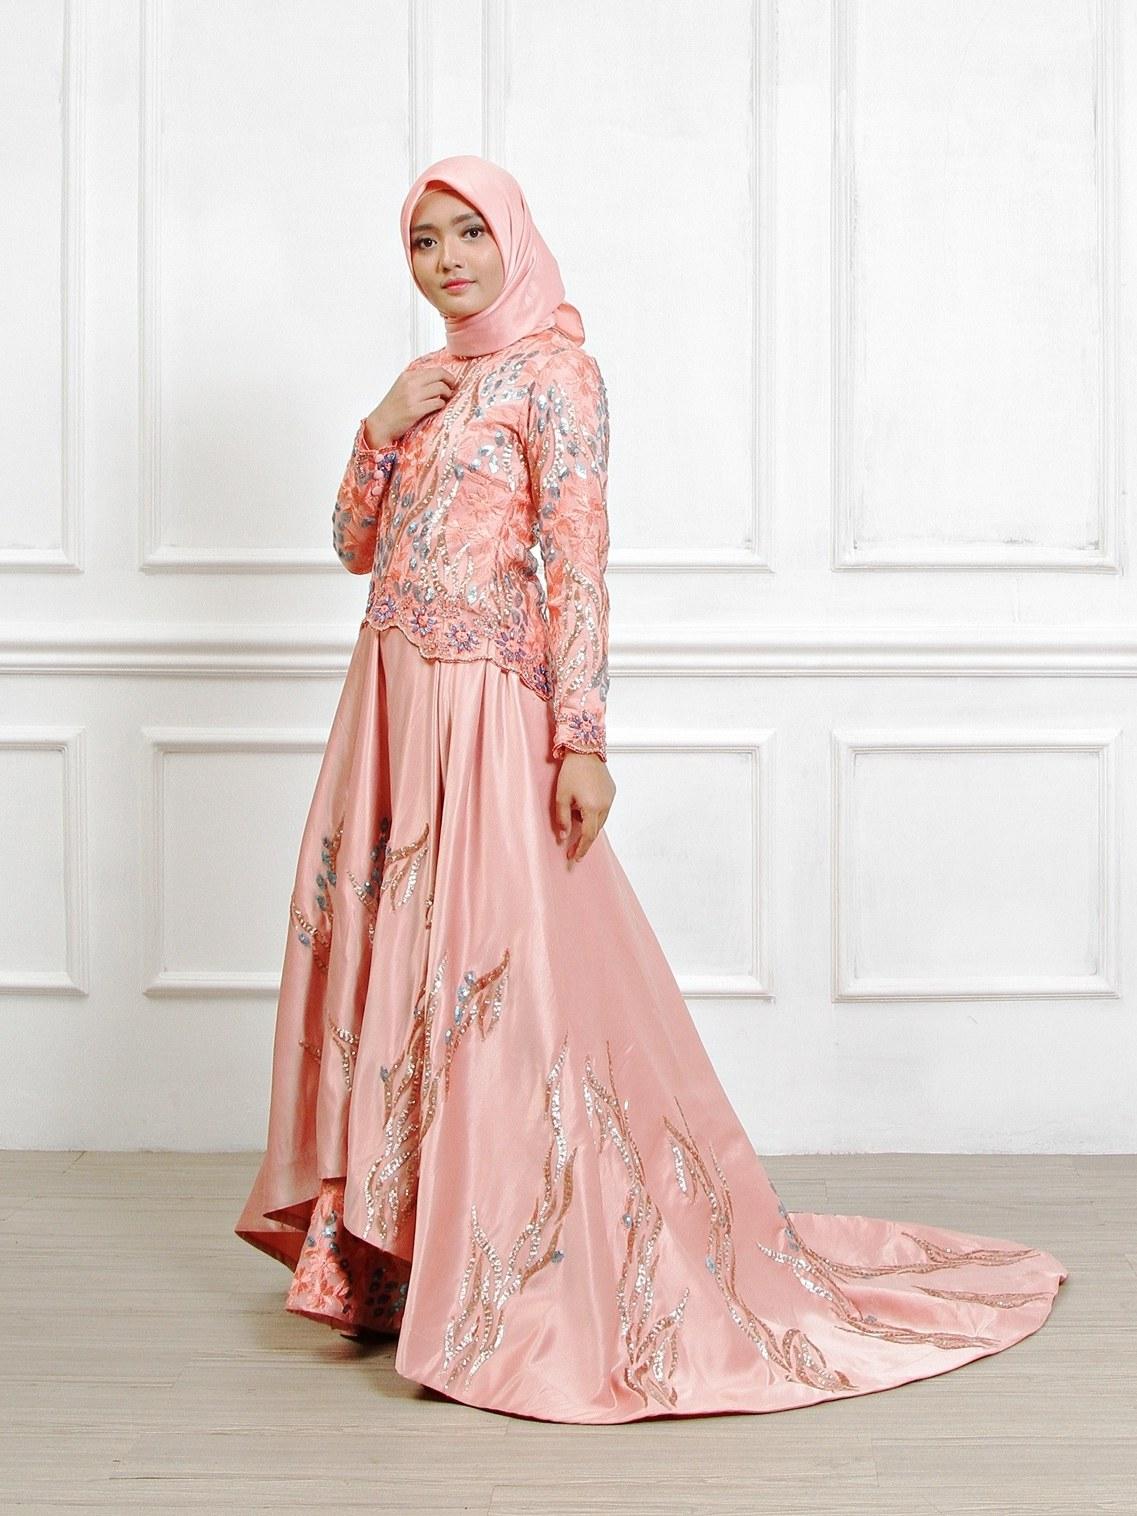 Bentuk Sewa Gaun Pengantin Muslimah Di solo Kvdd Gaun Pengantin Muslimah Dress Muslim Pungky Rumah Jahit